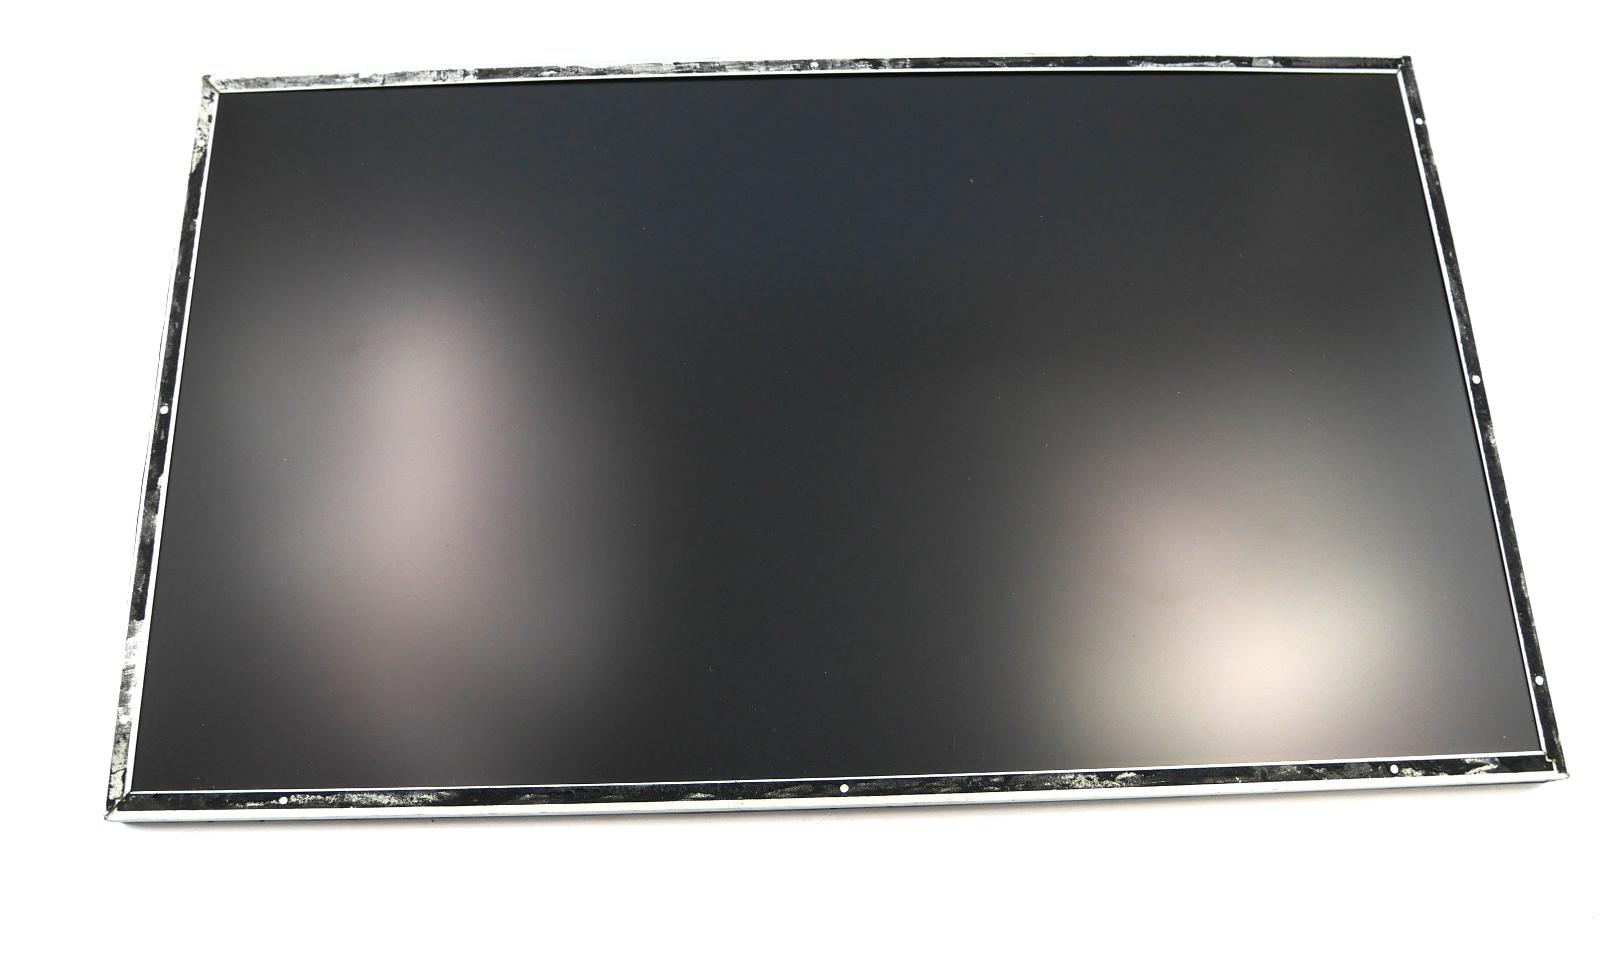 "Lenovo All-In-One Ideacentre LCD screen LTM230HL08 M03 Samsung 23"" 1920x1080"